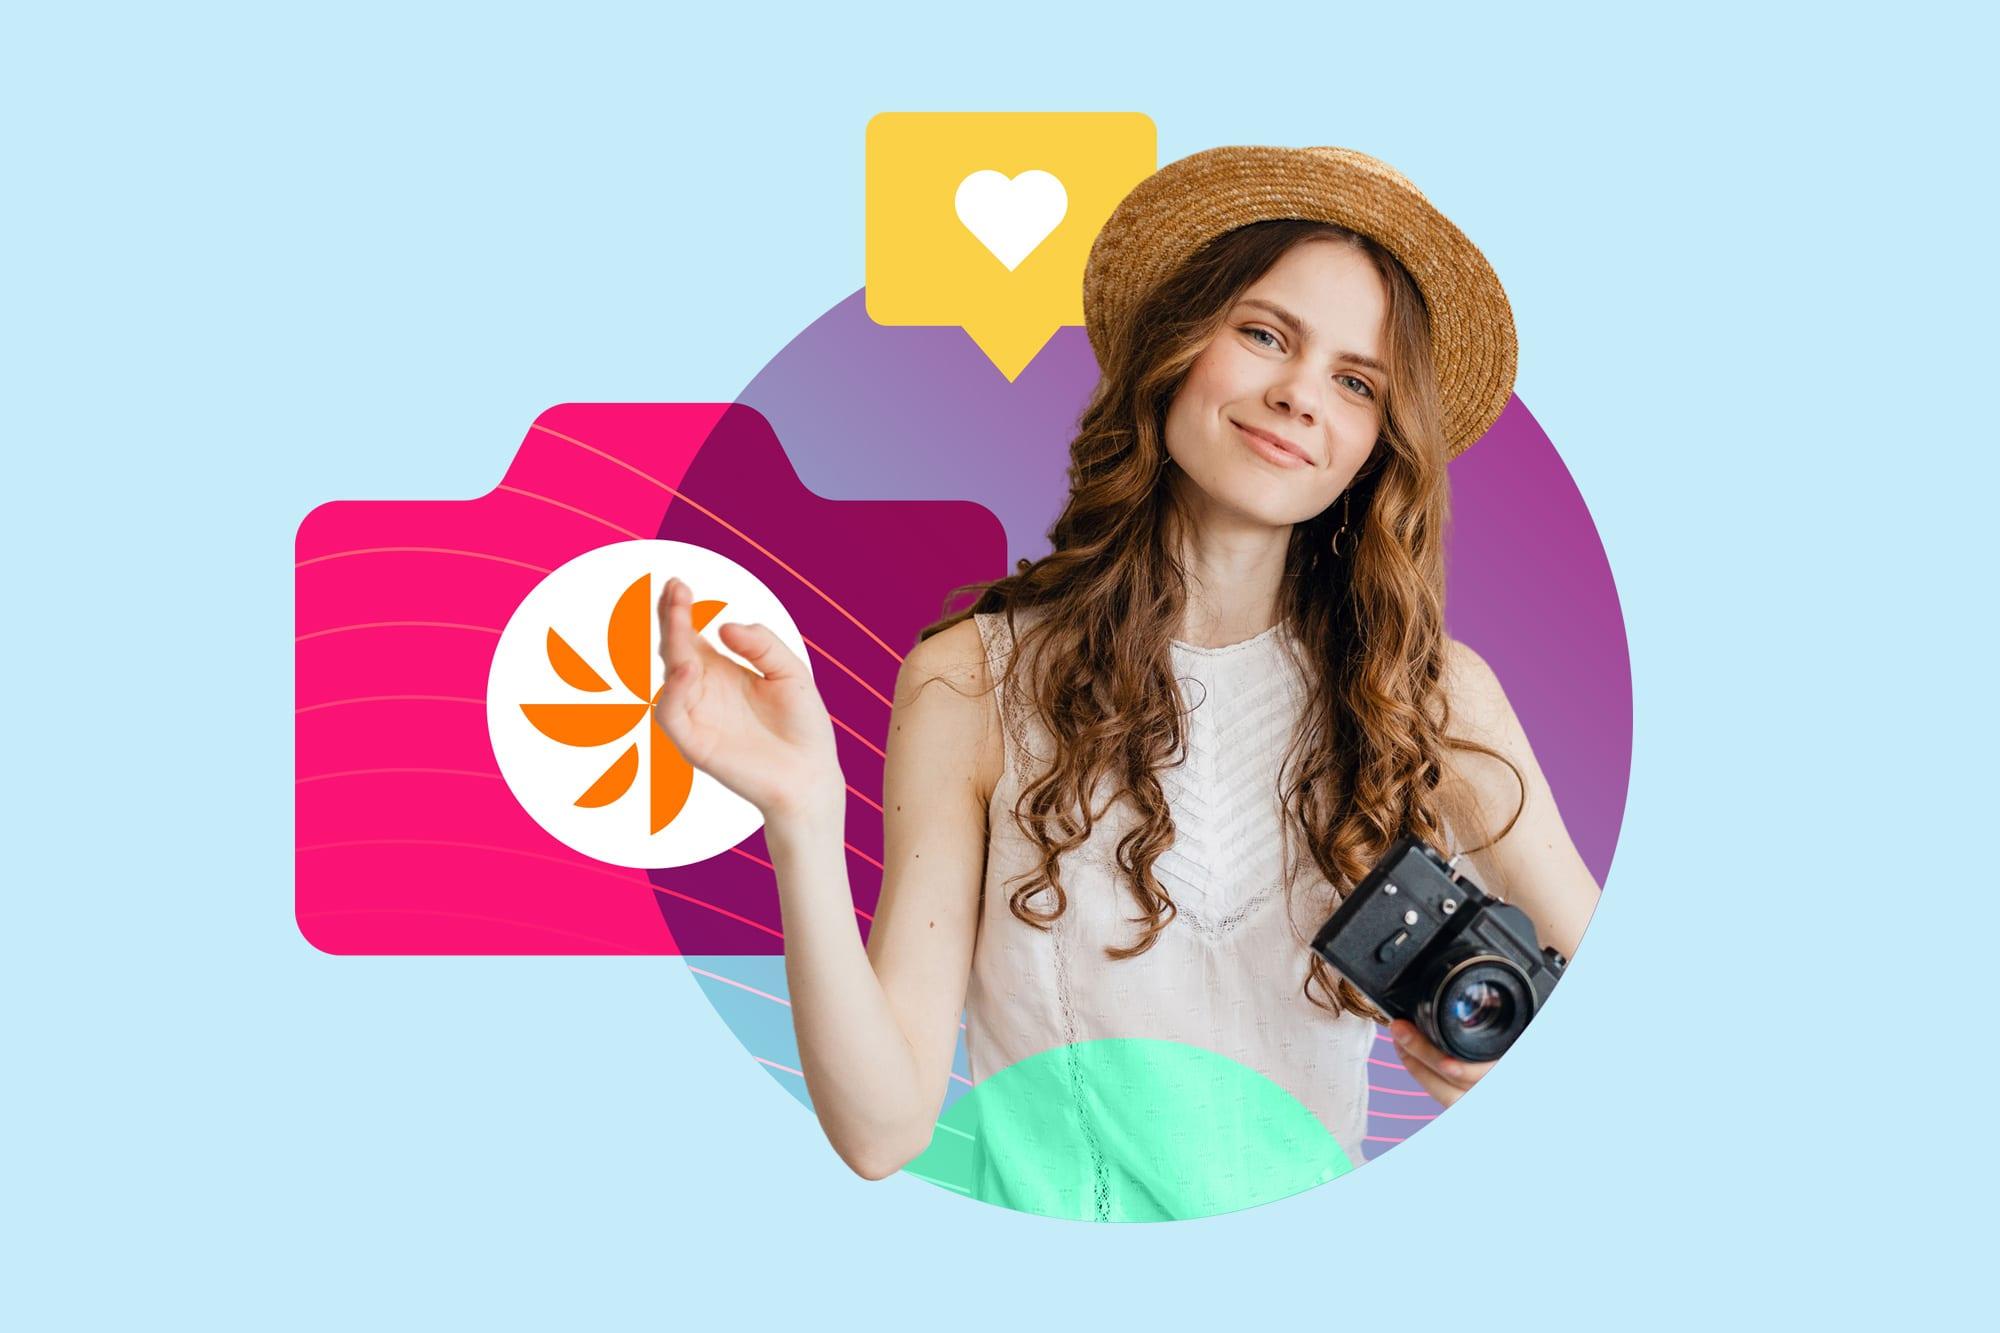 girl hat camera heart izea